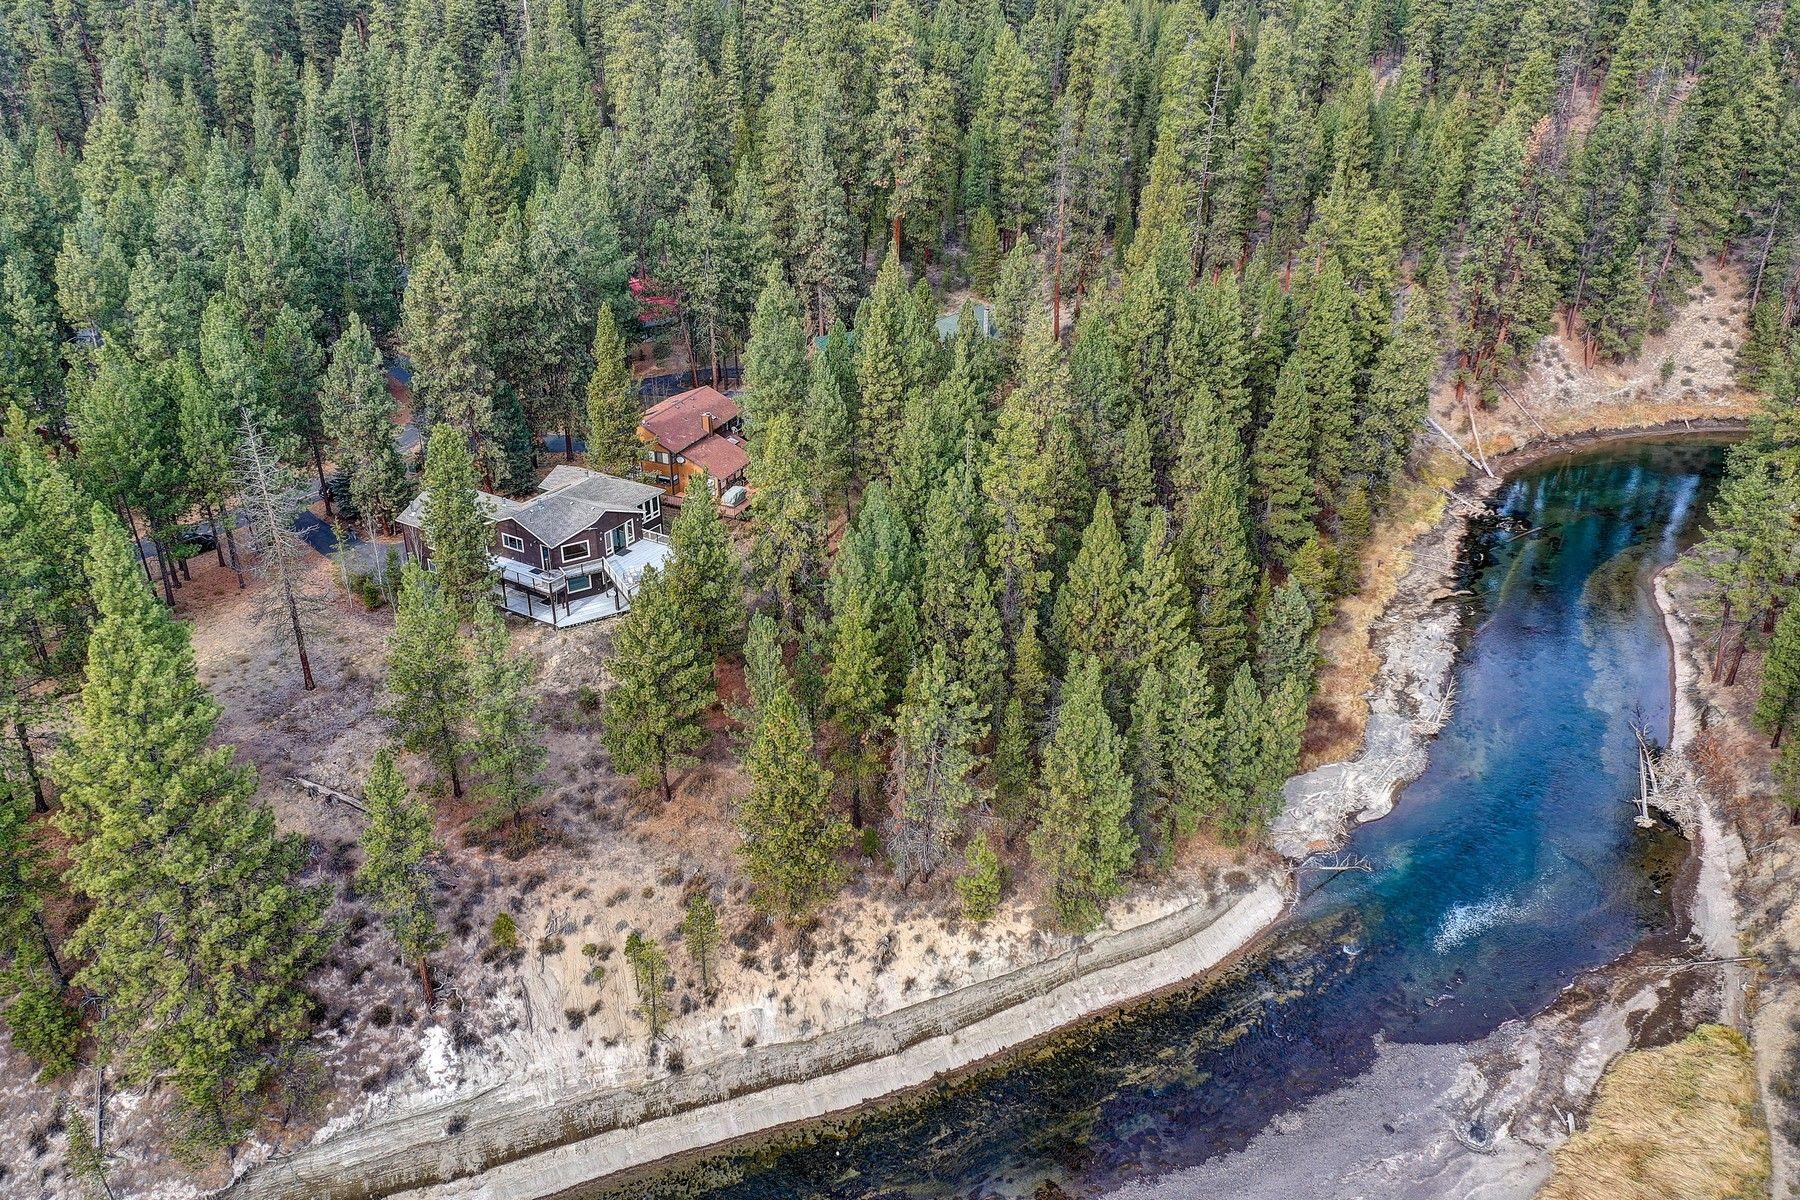 Other Residential Homes για την Πώληση στο 53562 Wildriver Way La Pine, OR 97739 La Pine, Ορεγκον 97739 Ηνωμένες Πολιτείες